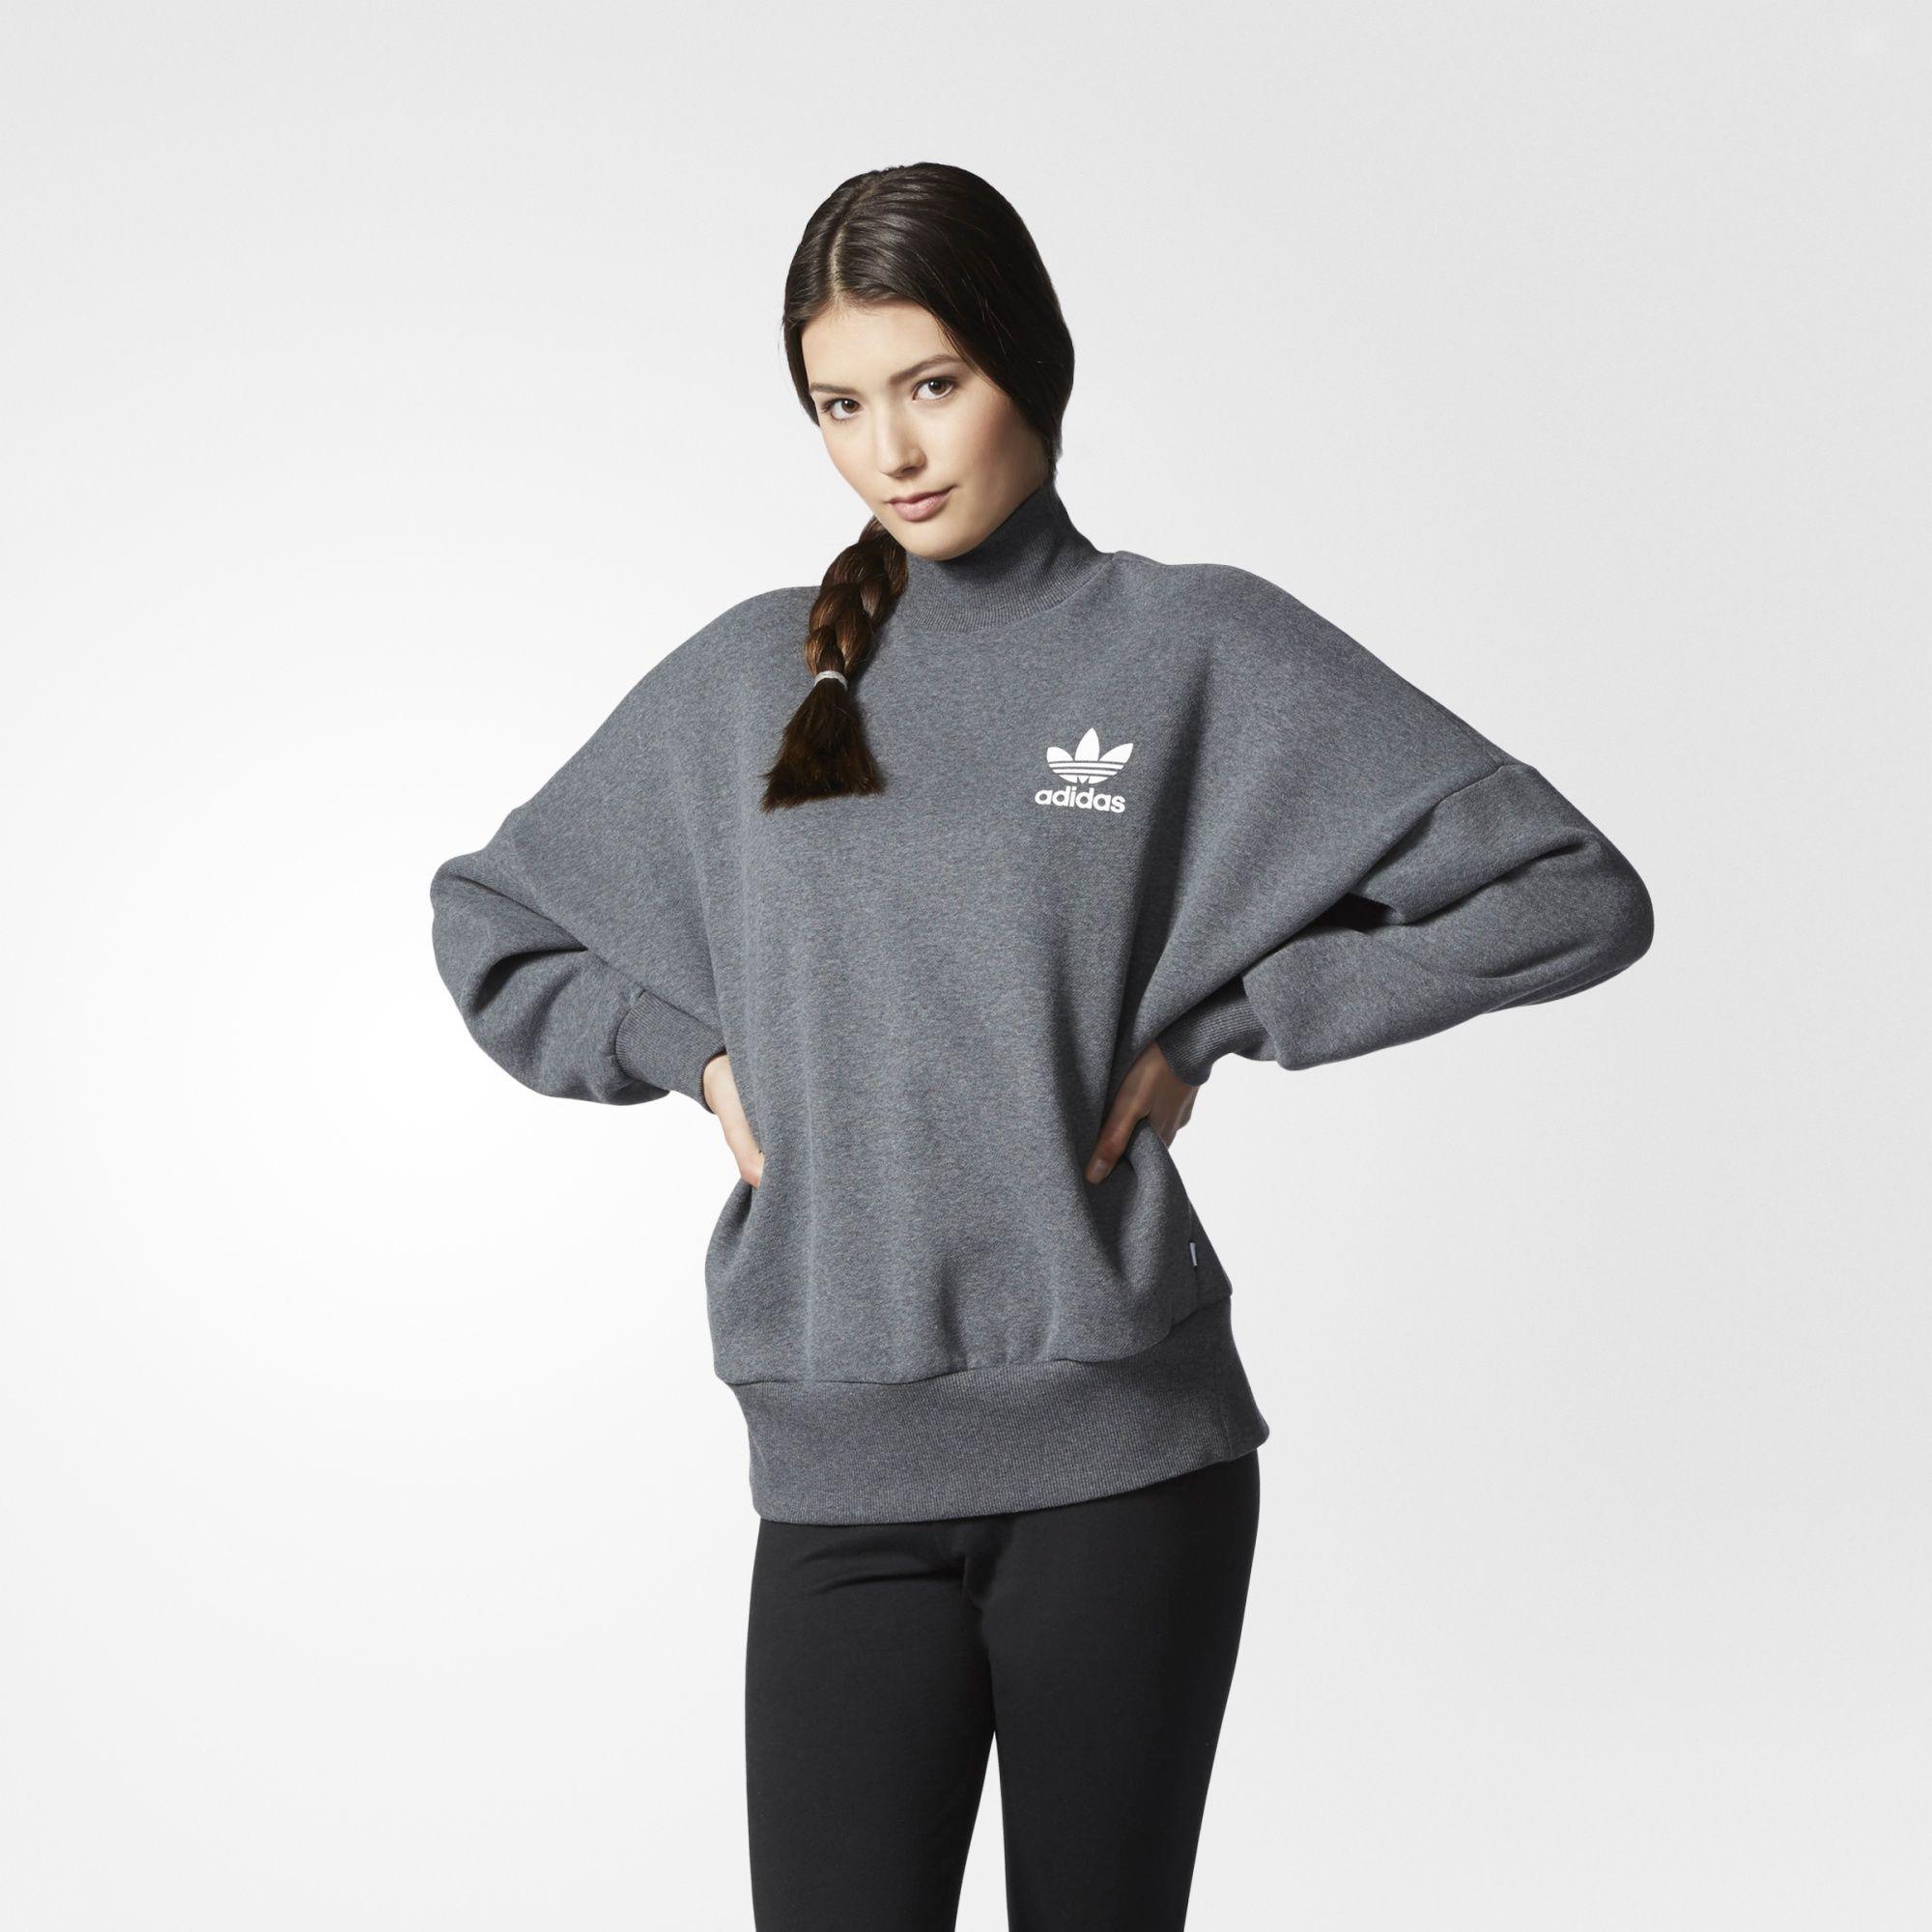 Adidas Sweatshirt Sweatshirts Hoodies Womens Sweatshirts Hoodie [ 2000 x 2000 Pixel ]